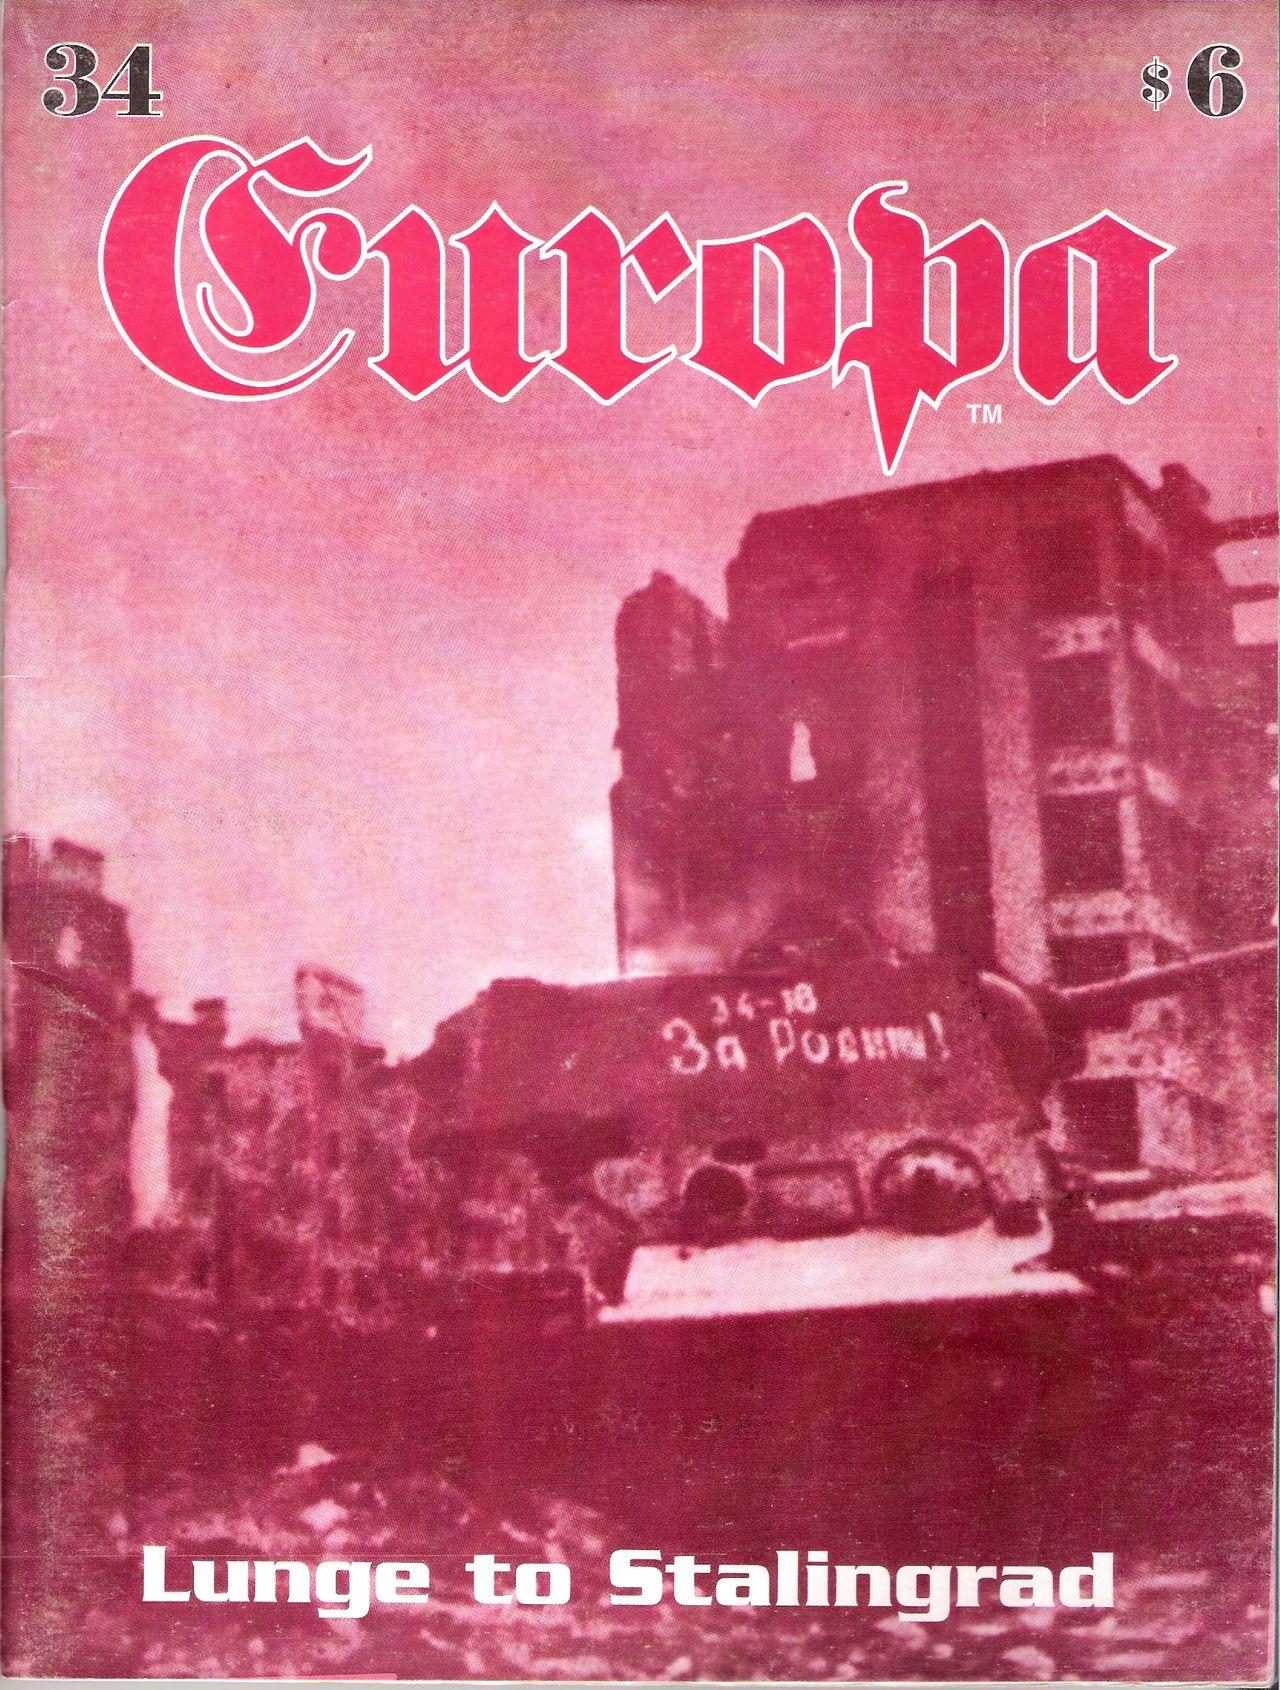 The Europa Magazine #34 - Cover